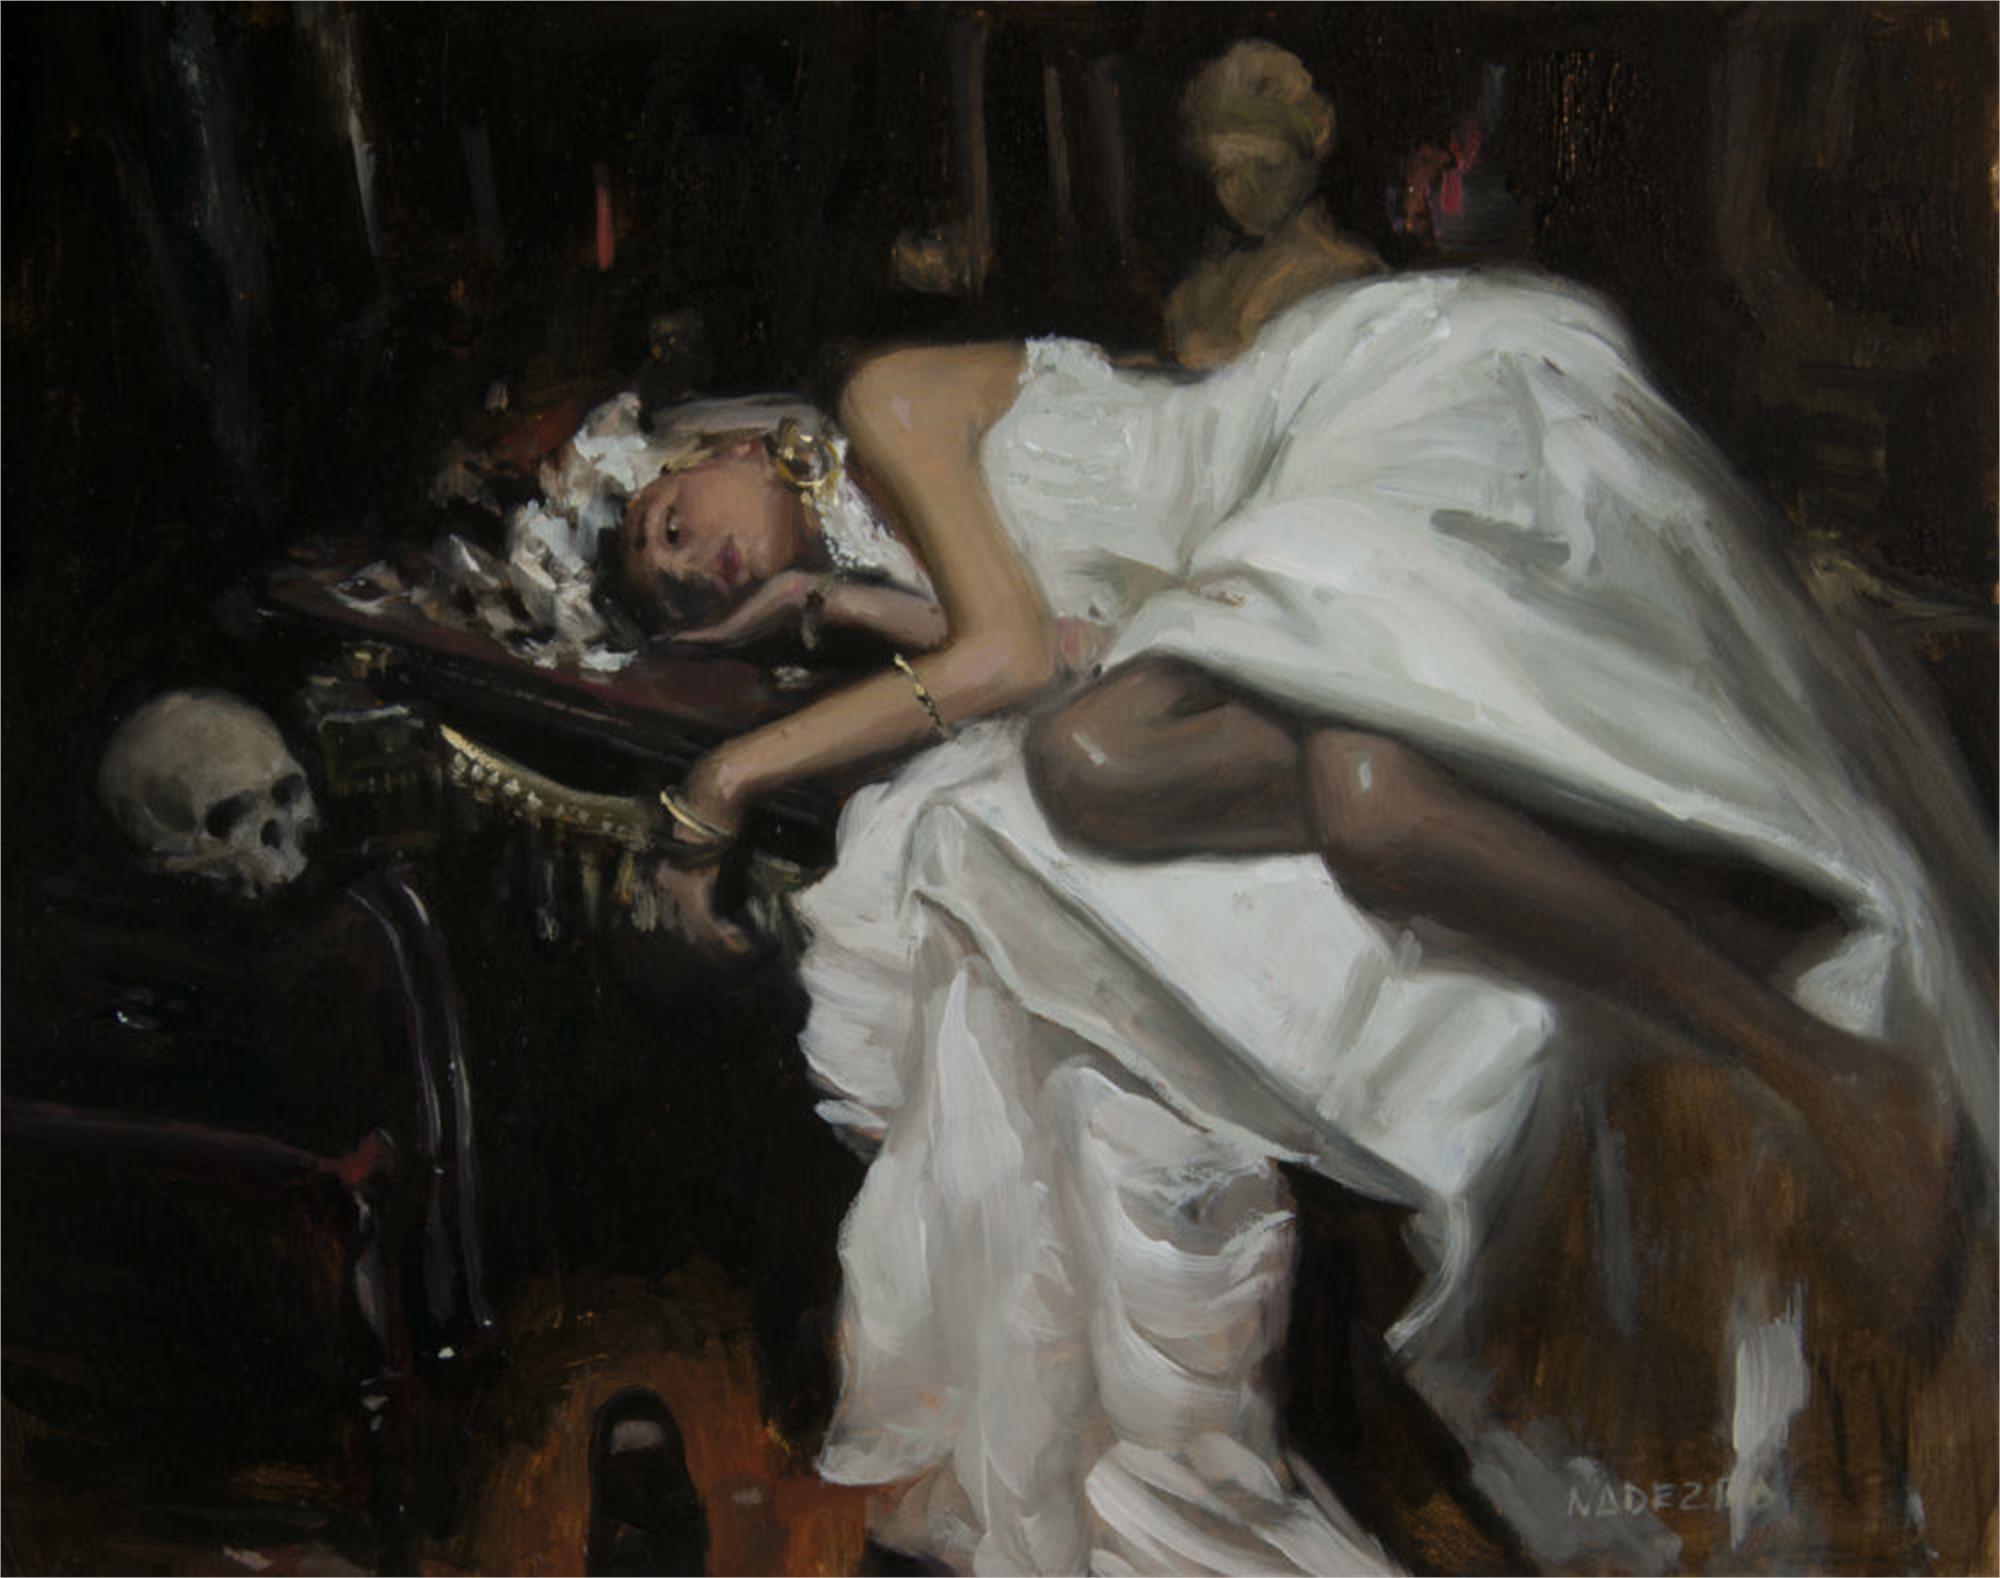 D'Apres Elle by Nadezda